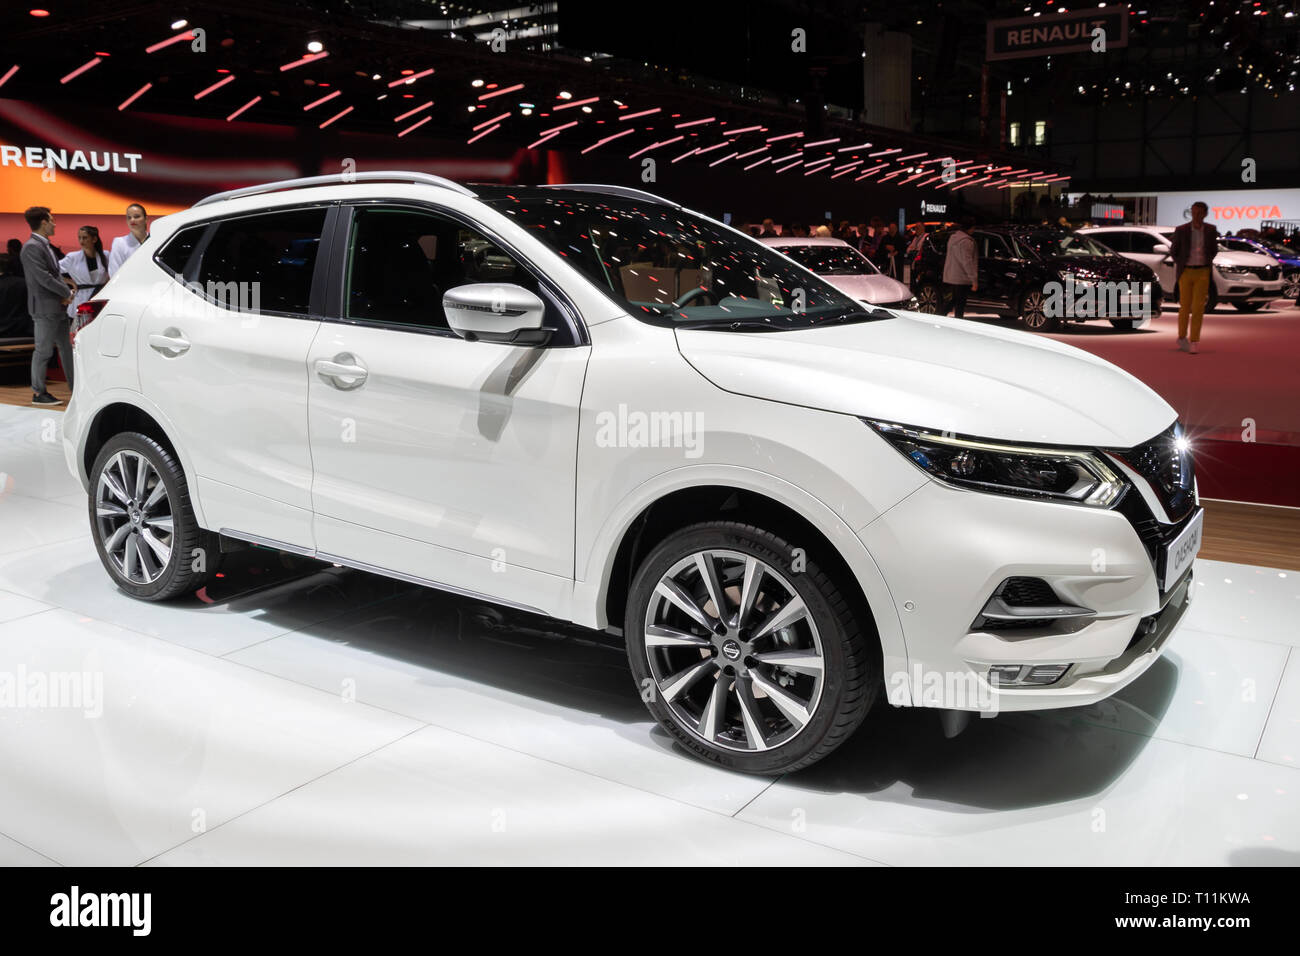 GENEVA, SWITZERLAND - MARCH 5, 2019: Nissan Qashqai car showcased at the 89th Geneva International Motor Show. - Stock Image